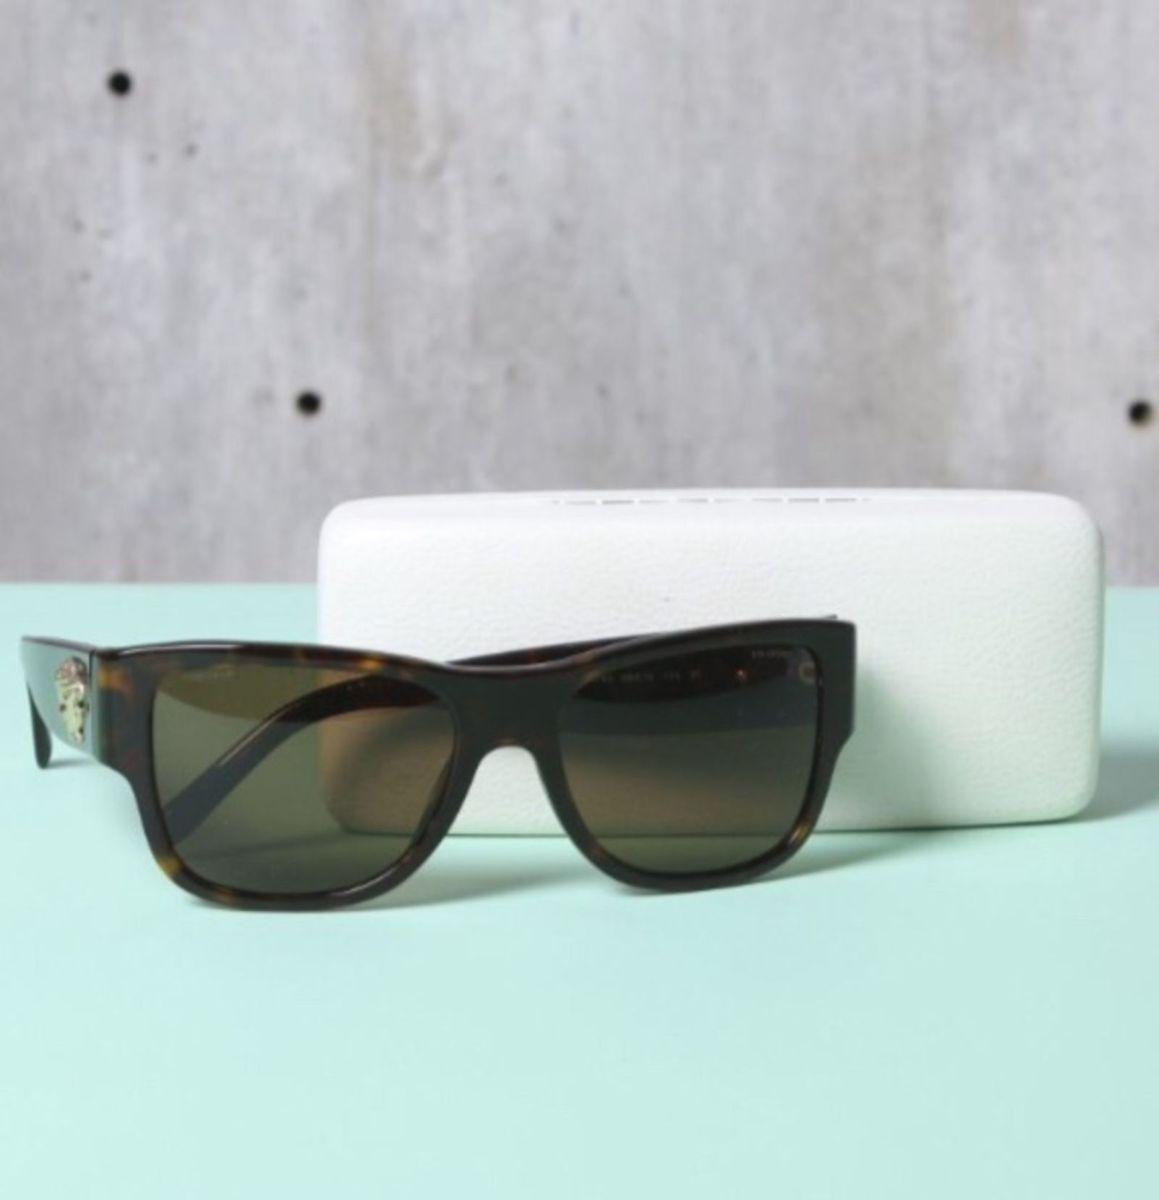 4b3c4b7cf oculos versace - óculos versace.  Czm6ly9wag90b3muzw5qb2vplmnvbs5ici9wcm9kdwn0cy81mzcyotm0lzviytbkm2e0yza2mzfizwvmytq3mdyxztdmzte0ntnllmpwzw